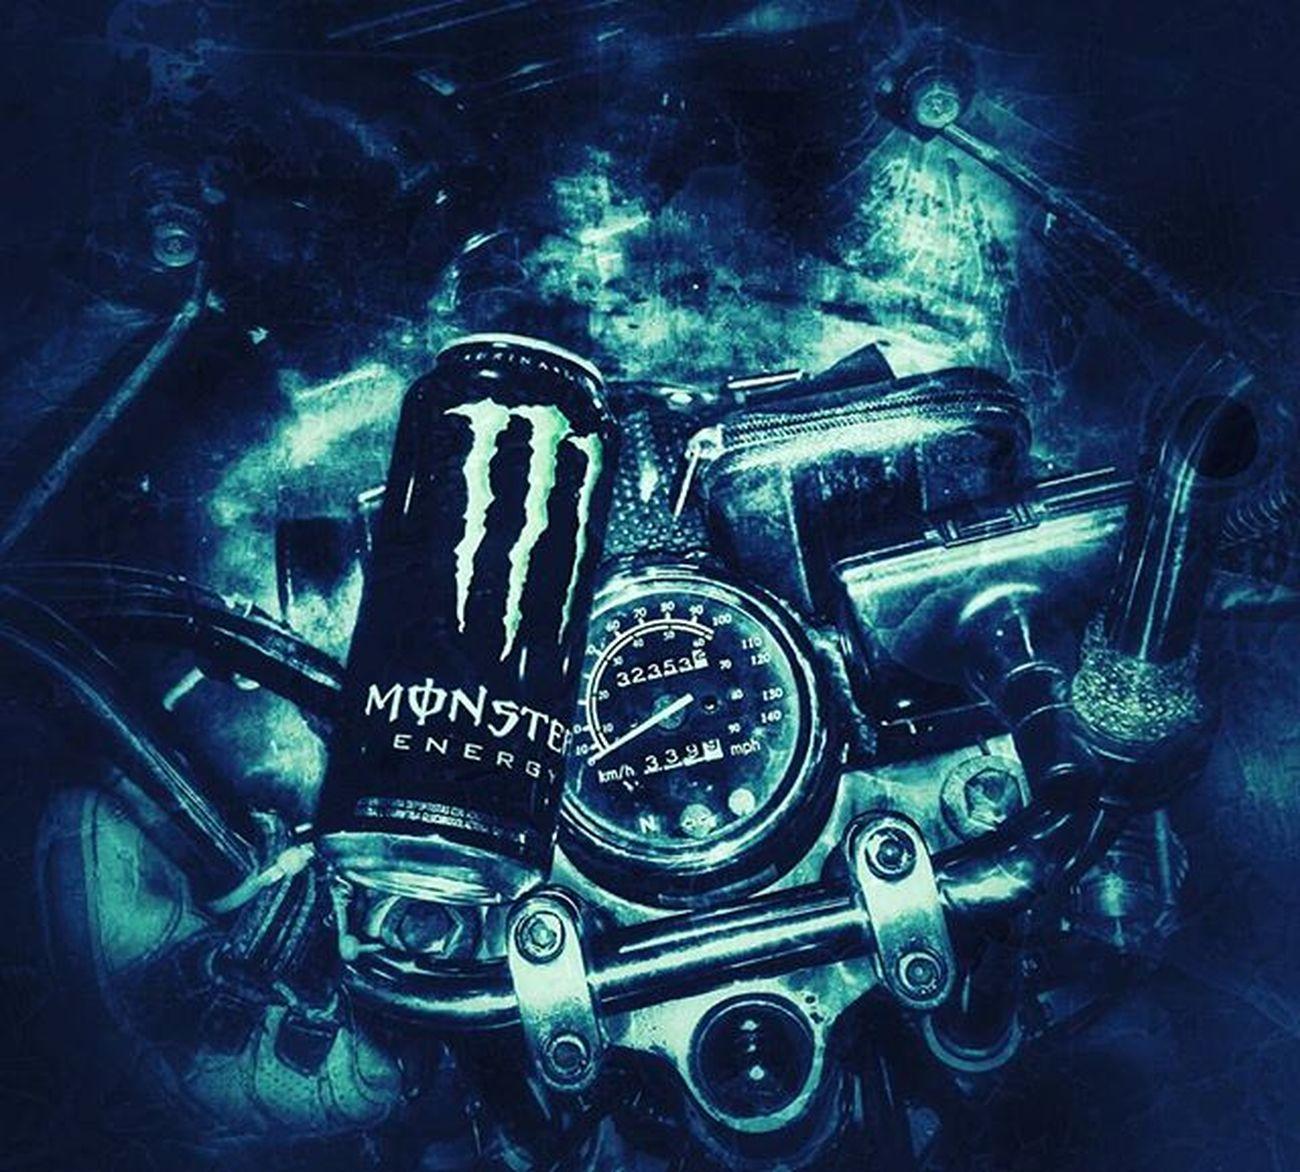 Monster torque ! Monster S5 Snapseed Instachile Momentos Effect HDR Vintage Biker Monsterbikerd